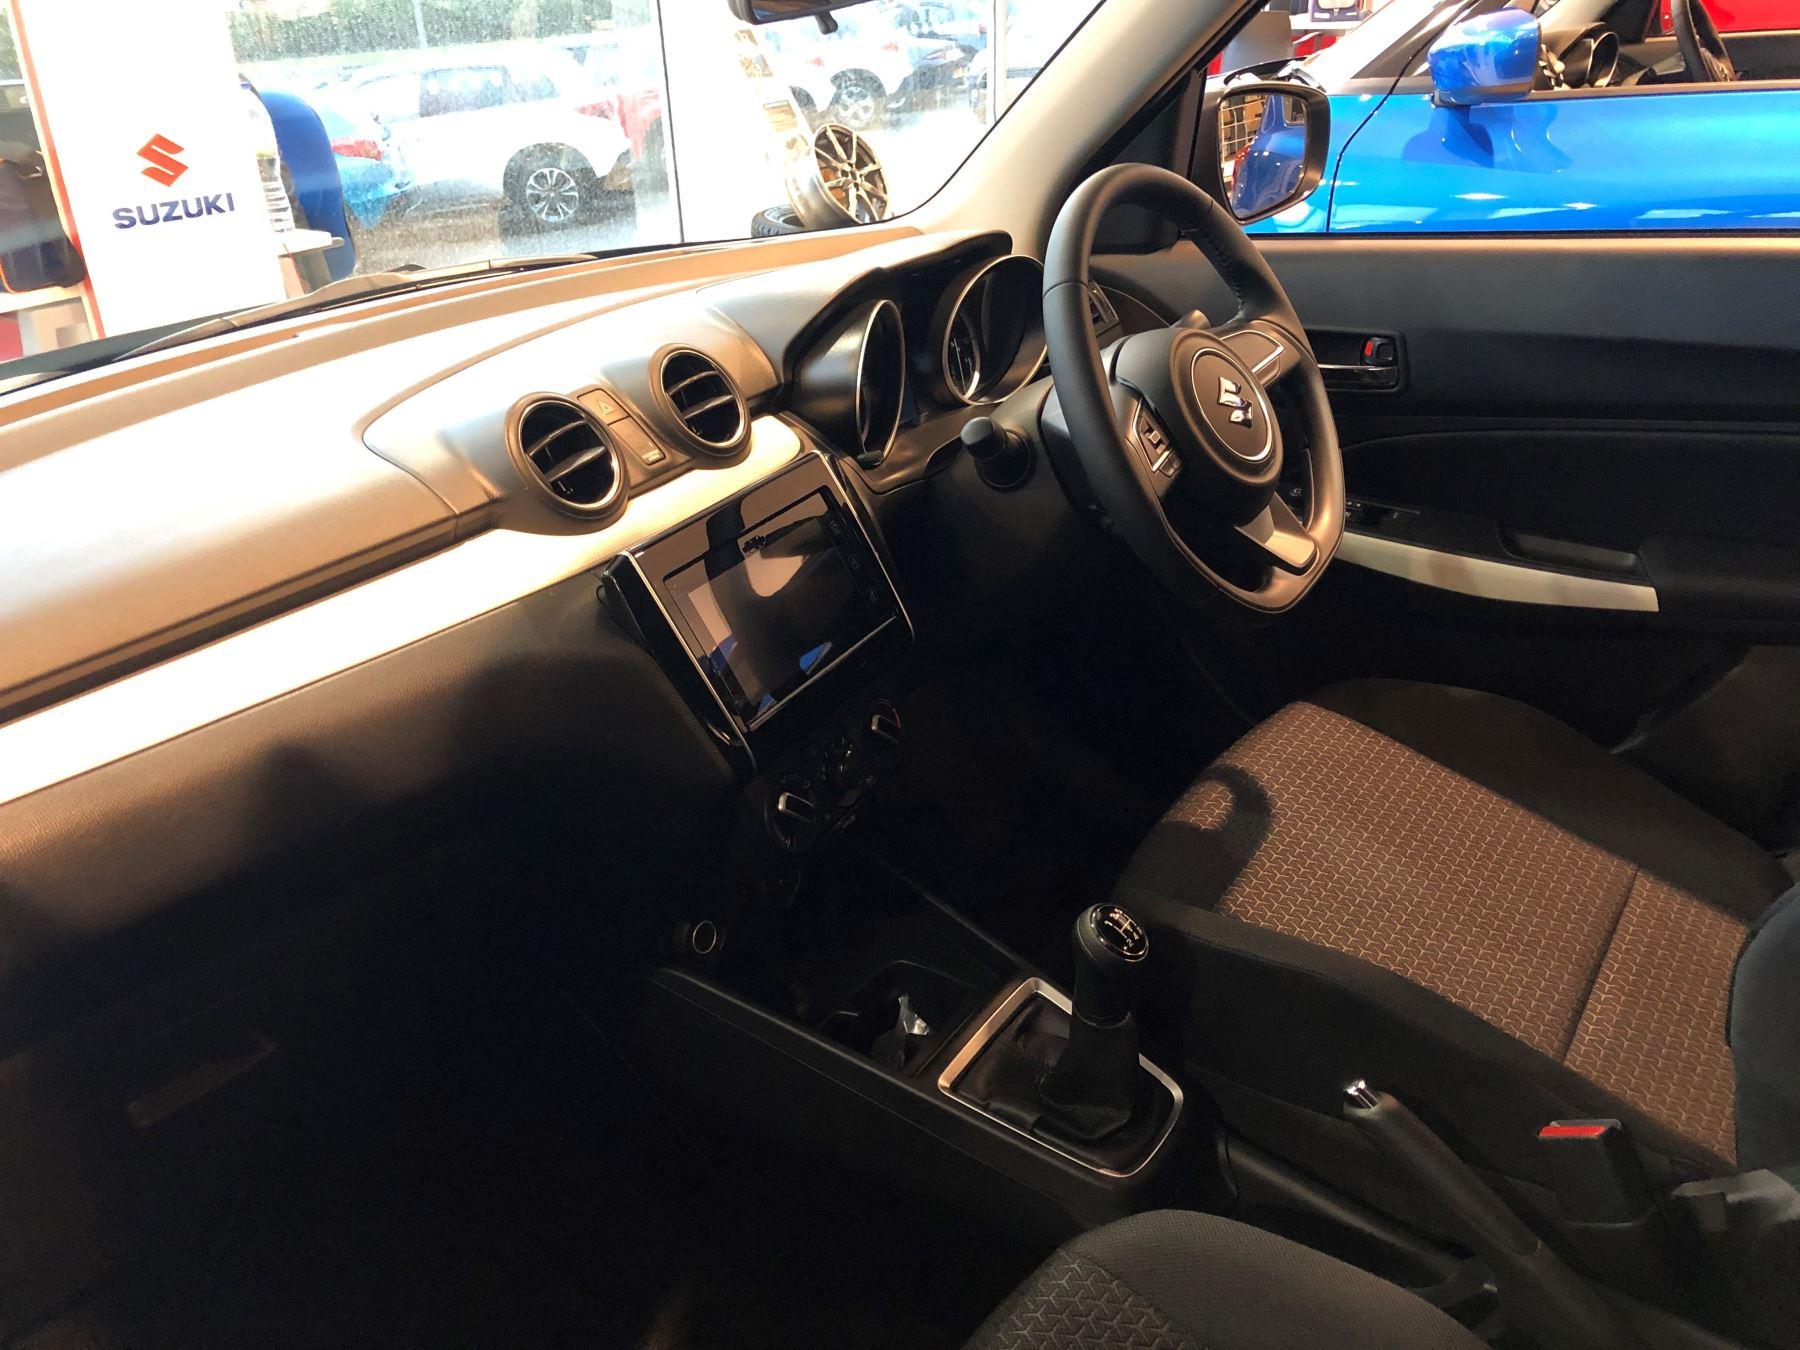 Suzuki Swift 1.2 Dualjet SHVS SZ-T image 8